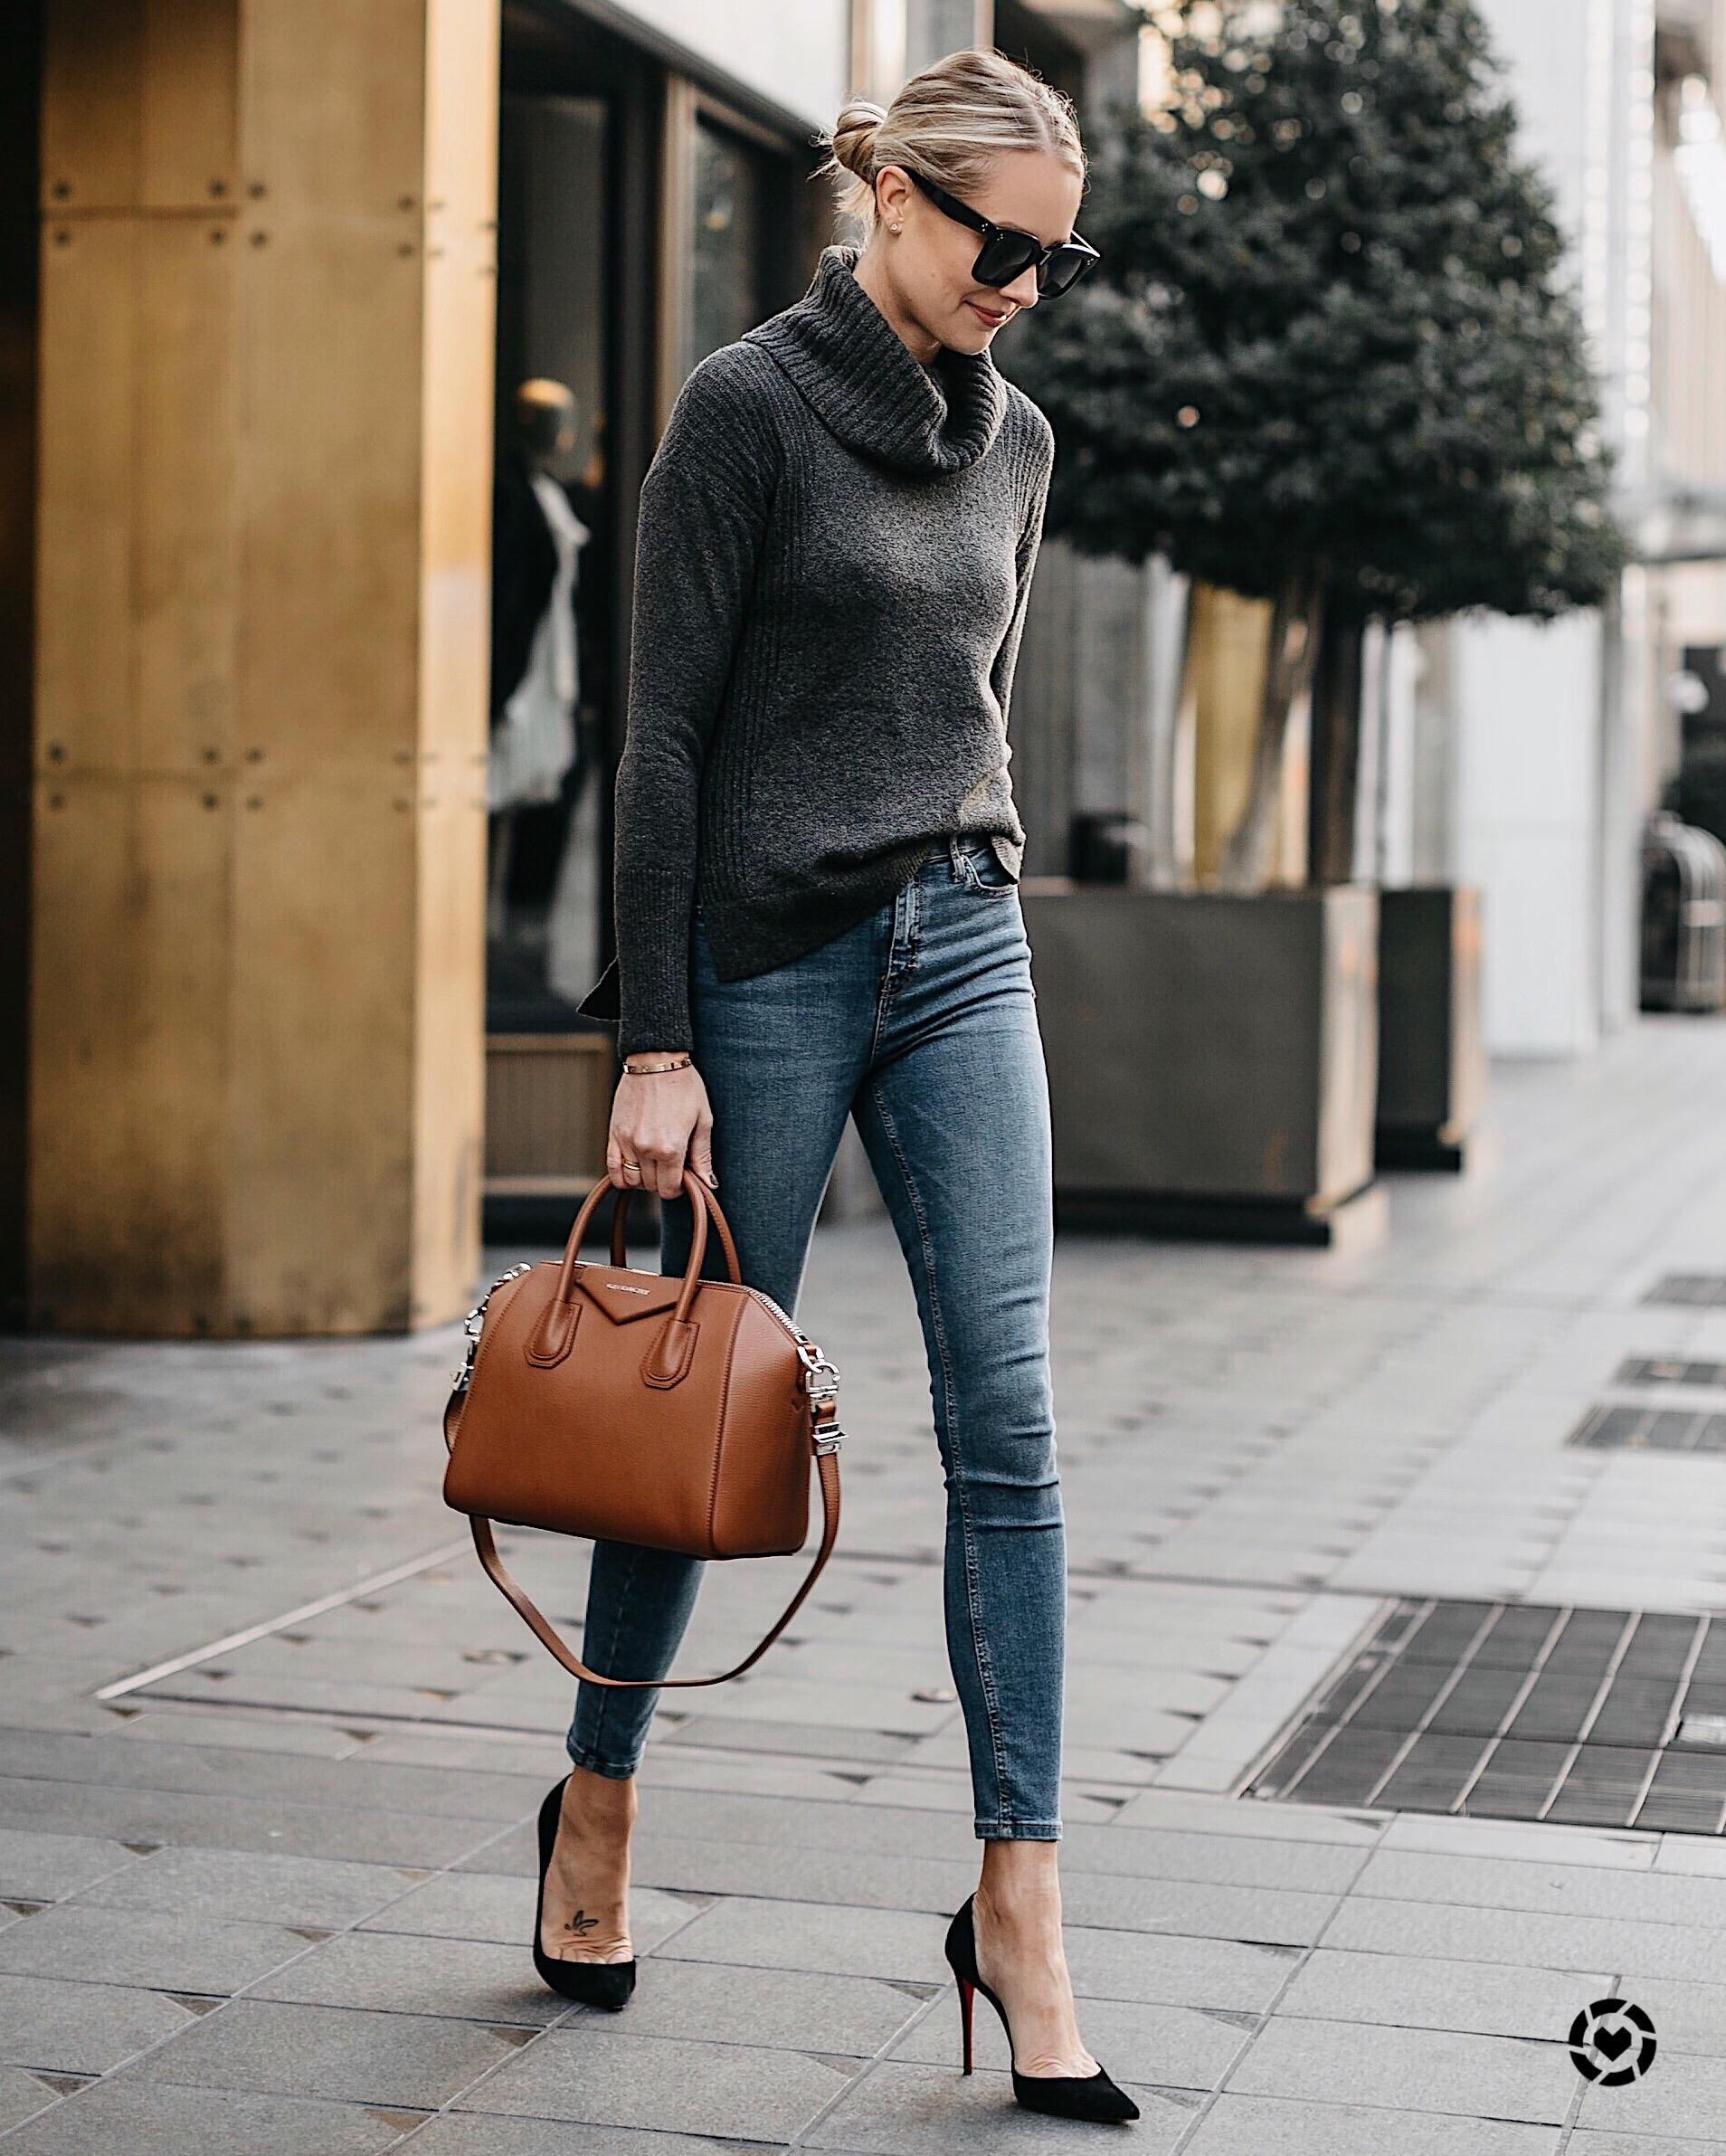 handbag jeans skinny jackson givenchy antigona grey designer cognac blonde woman instagram wearing street why invest outfits fashionjackson sweater pumps